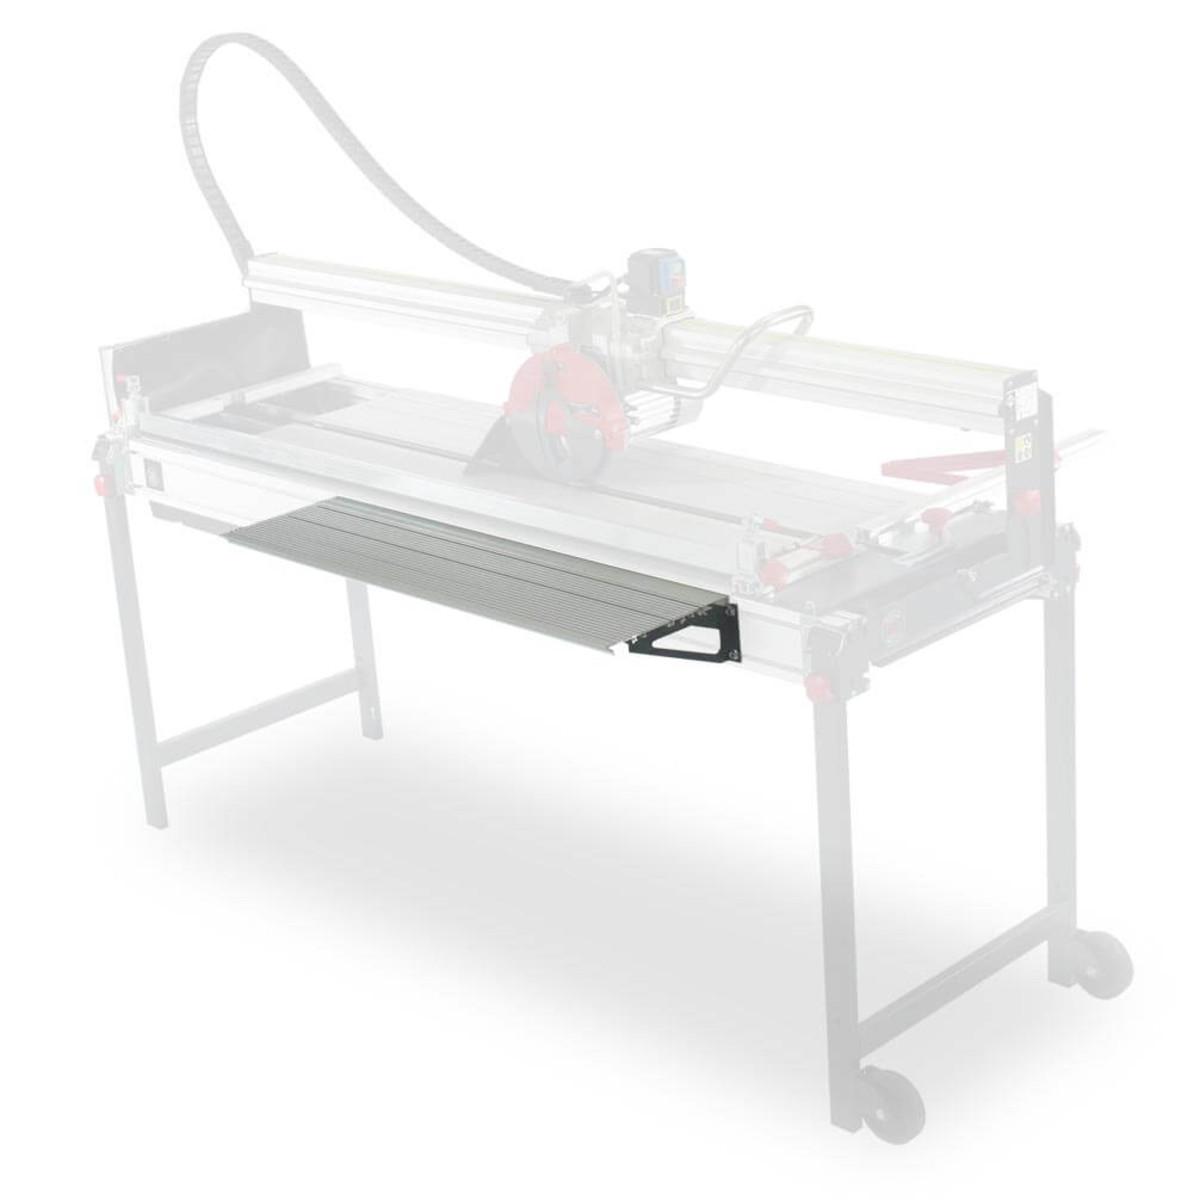 Rubi Table Extension rail saws